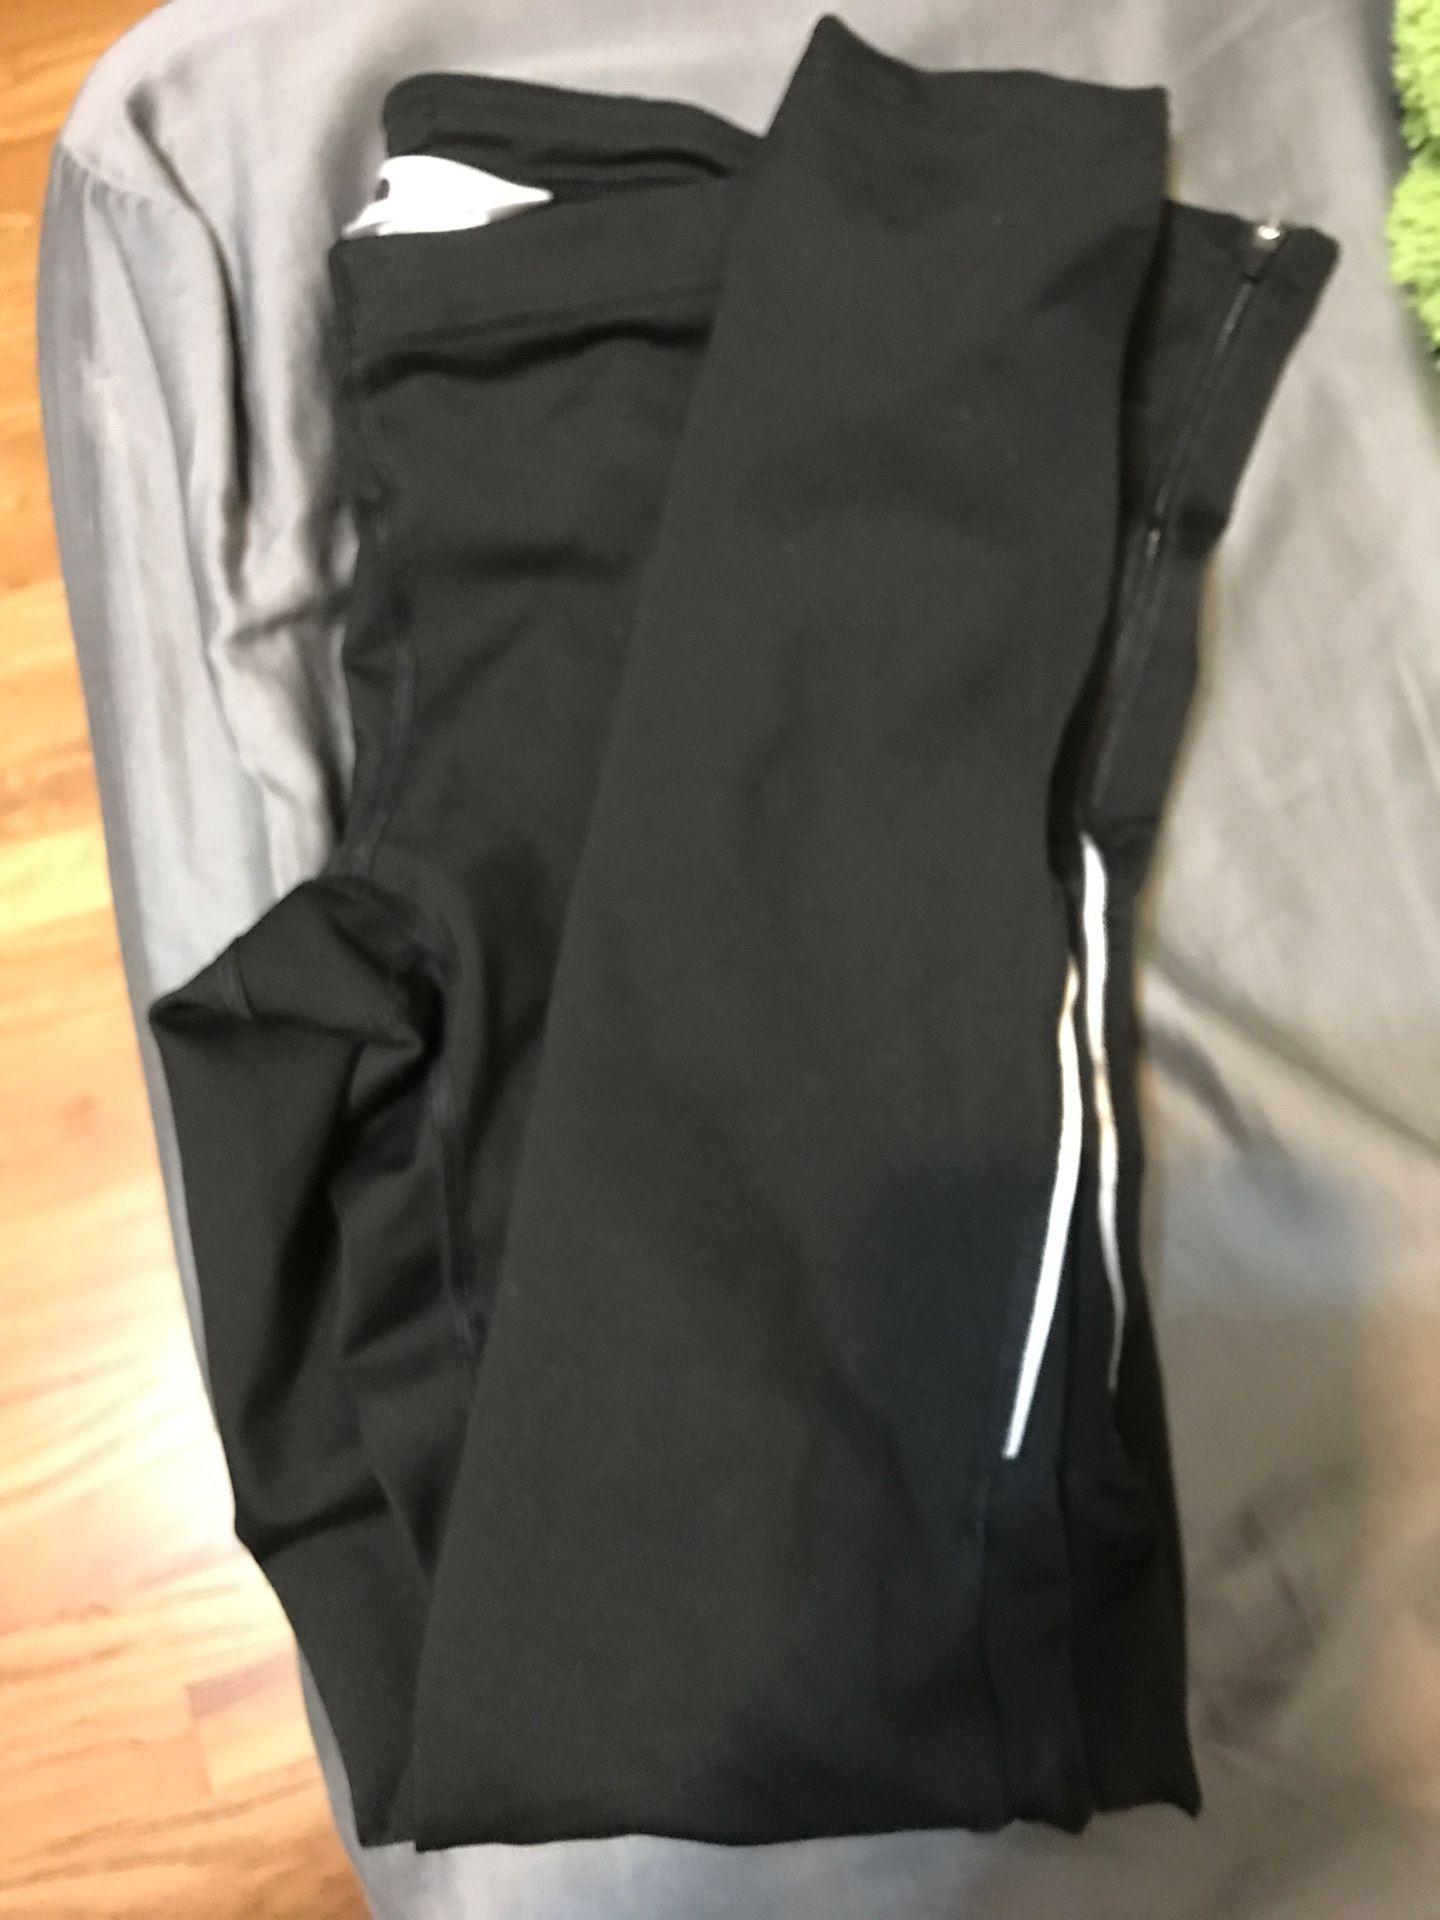 Black North Face leggings size XS